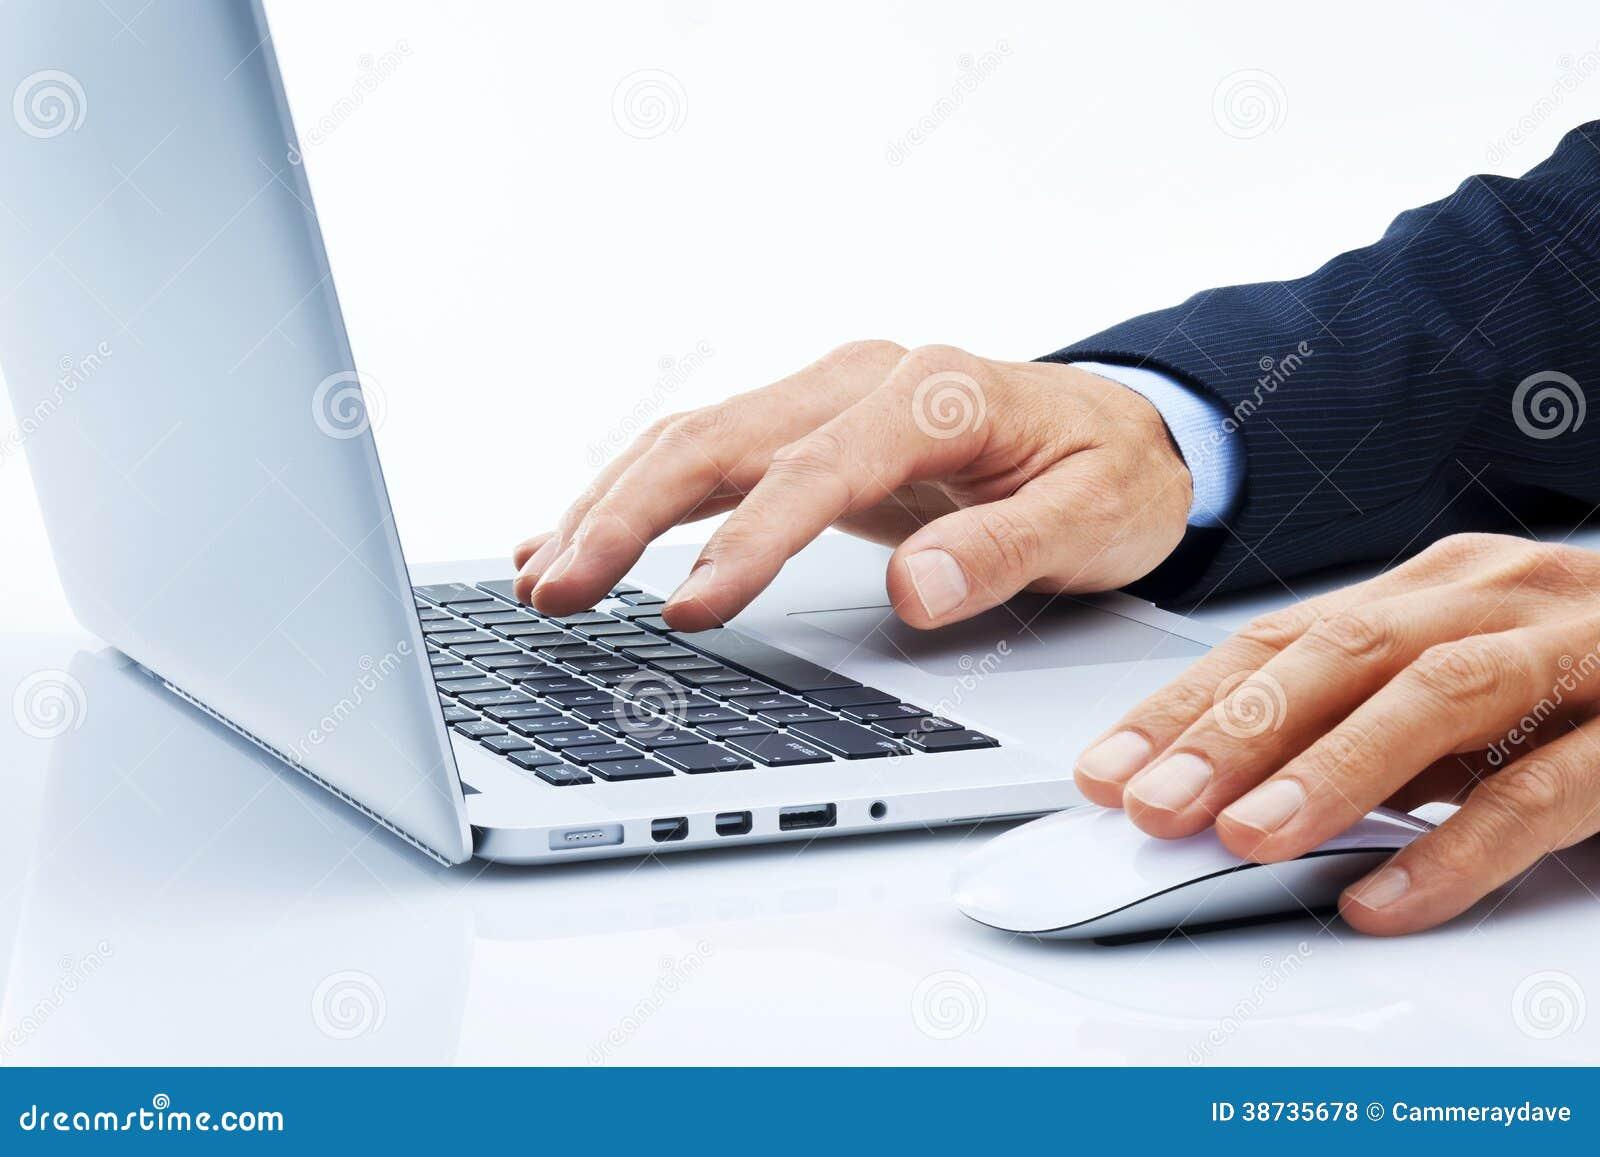 business computer hands marketing business computer